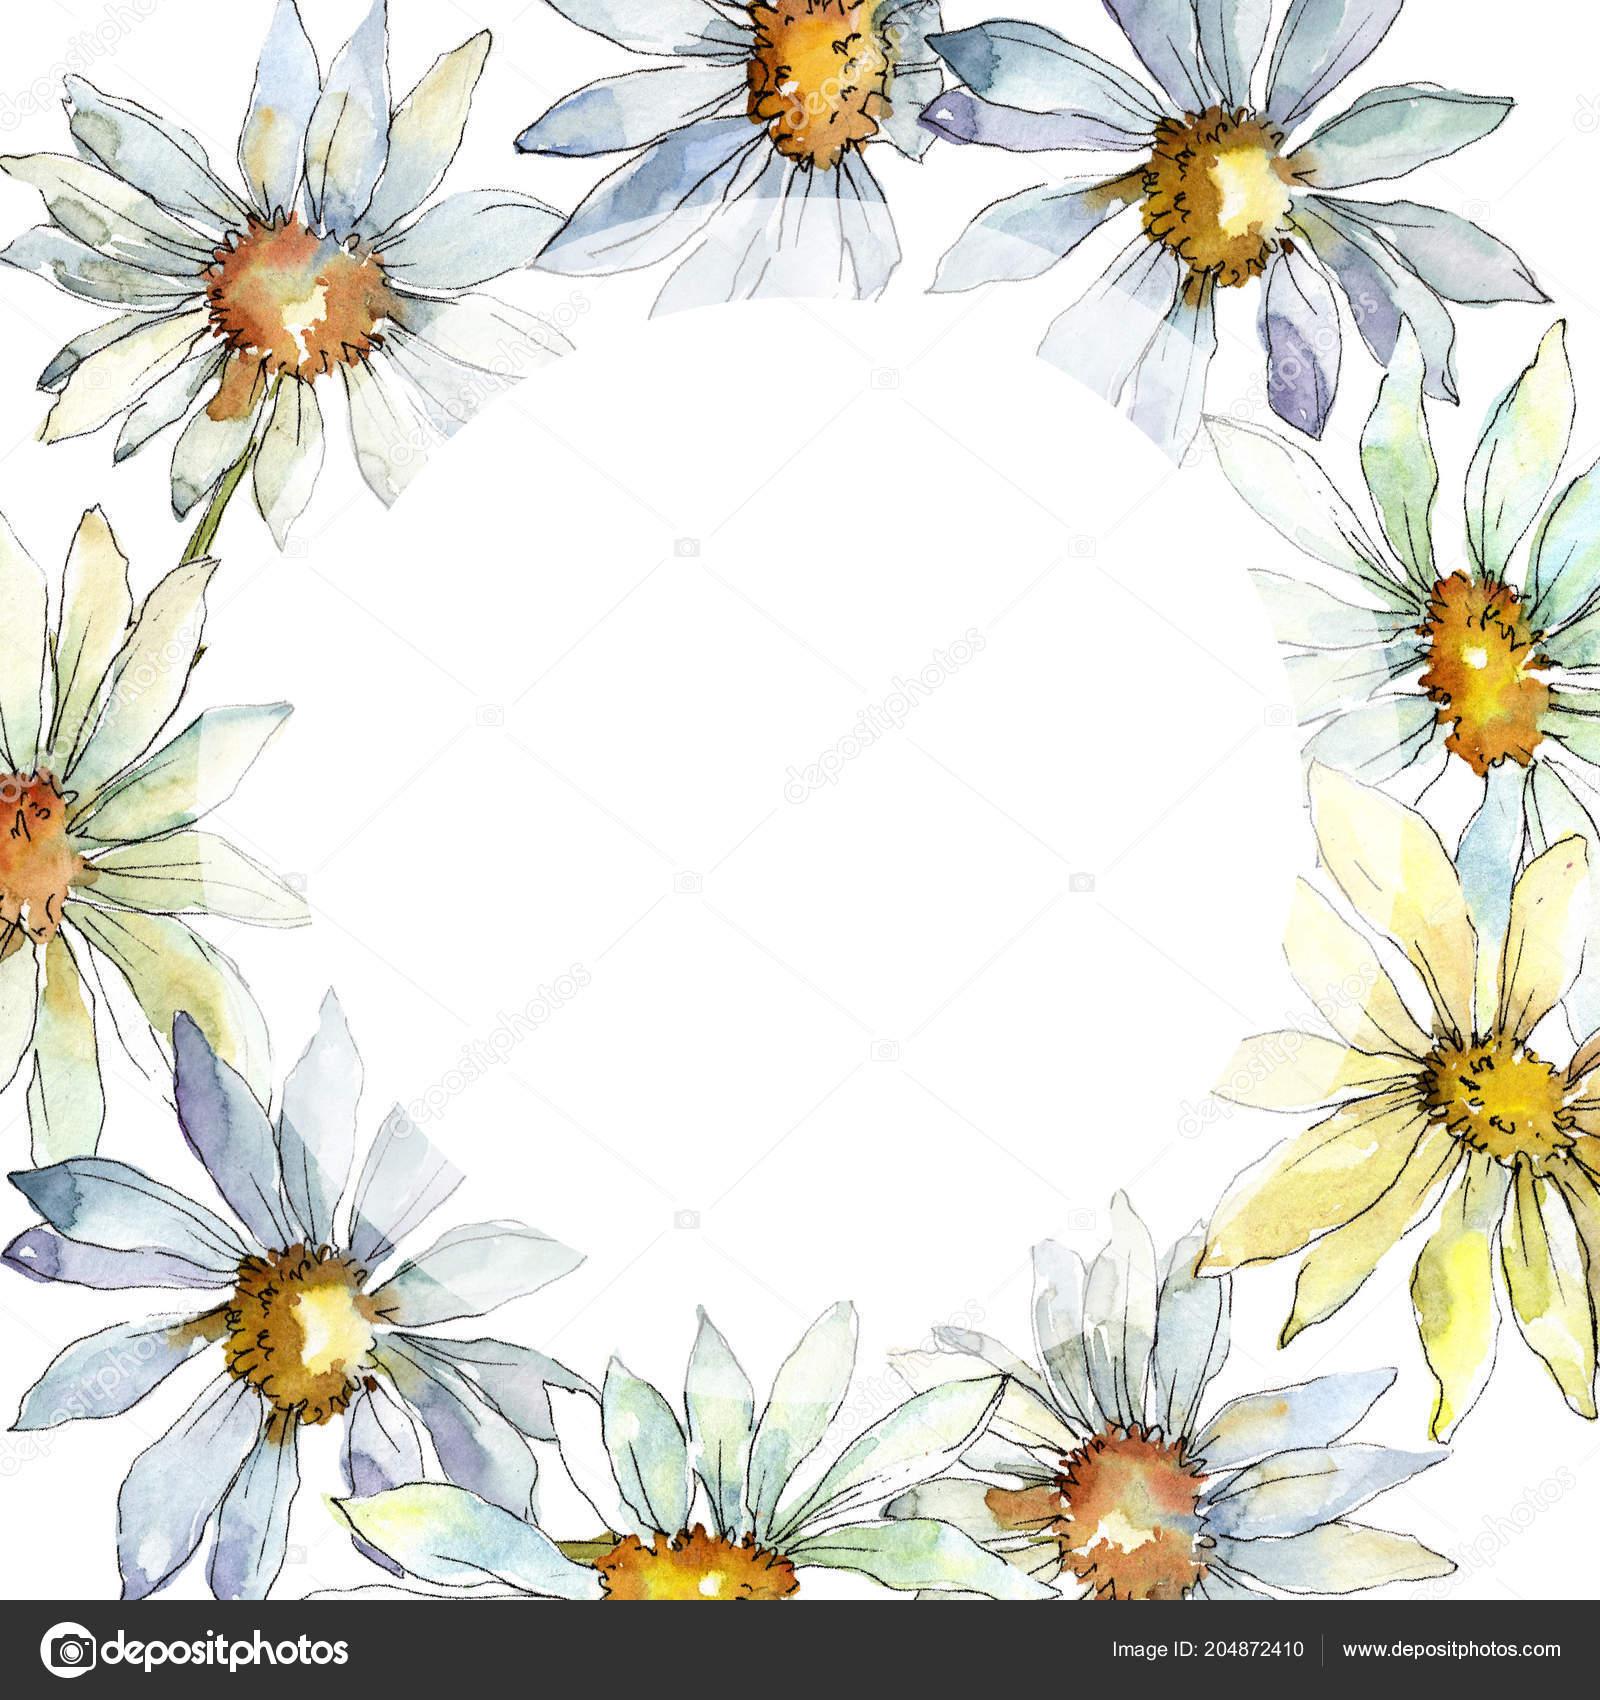 White daisy flower floral botanical flower frame border ornament white daisy flower floral botanical flower frame border ornament square stock photo izmirmasajfo